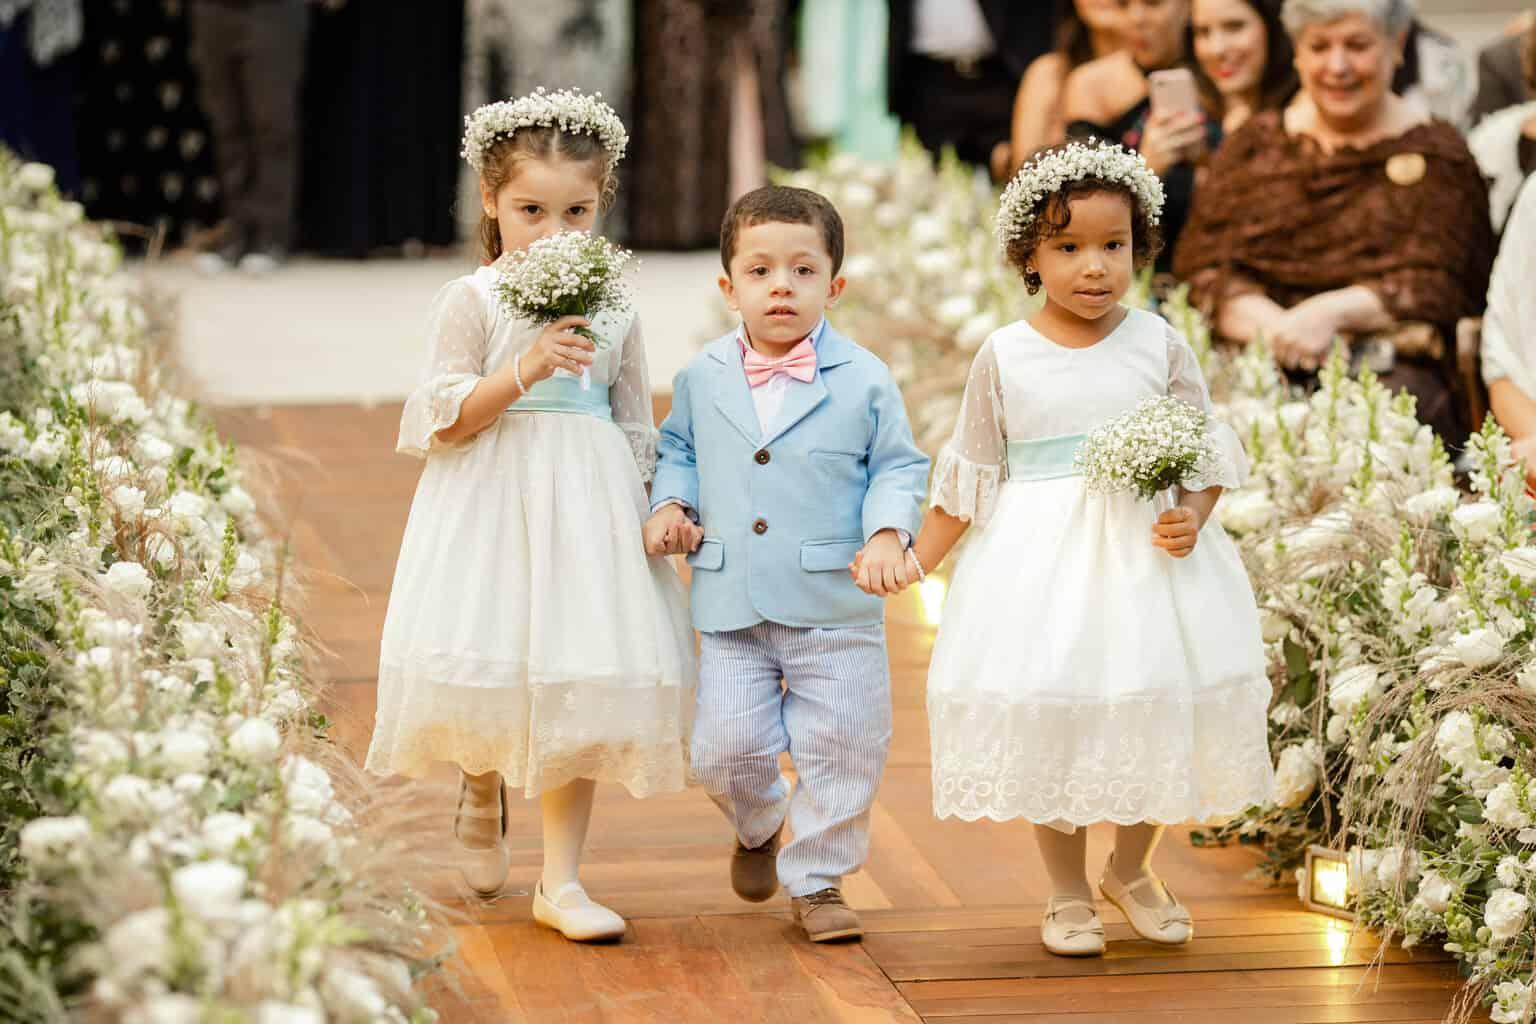 casamento-Beatriz-e-Joao-Fernando-daminhas-e-pajens-Itaipava-Locanda-Della-Mimosa-Thienny-Tammis124